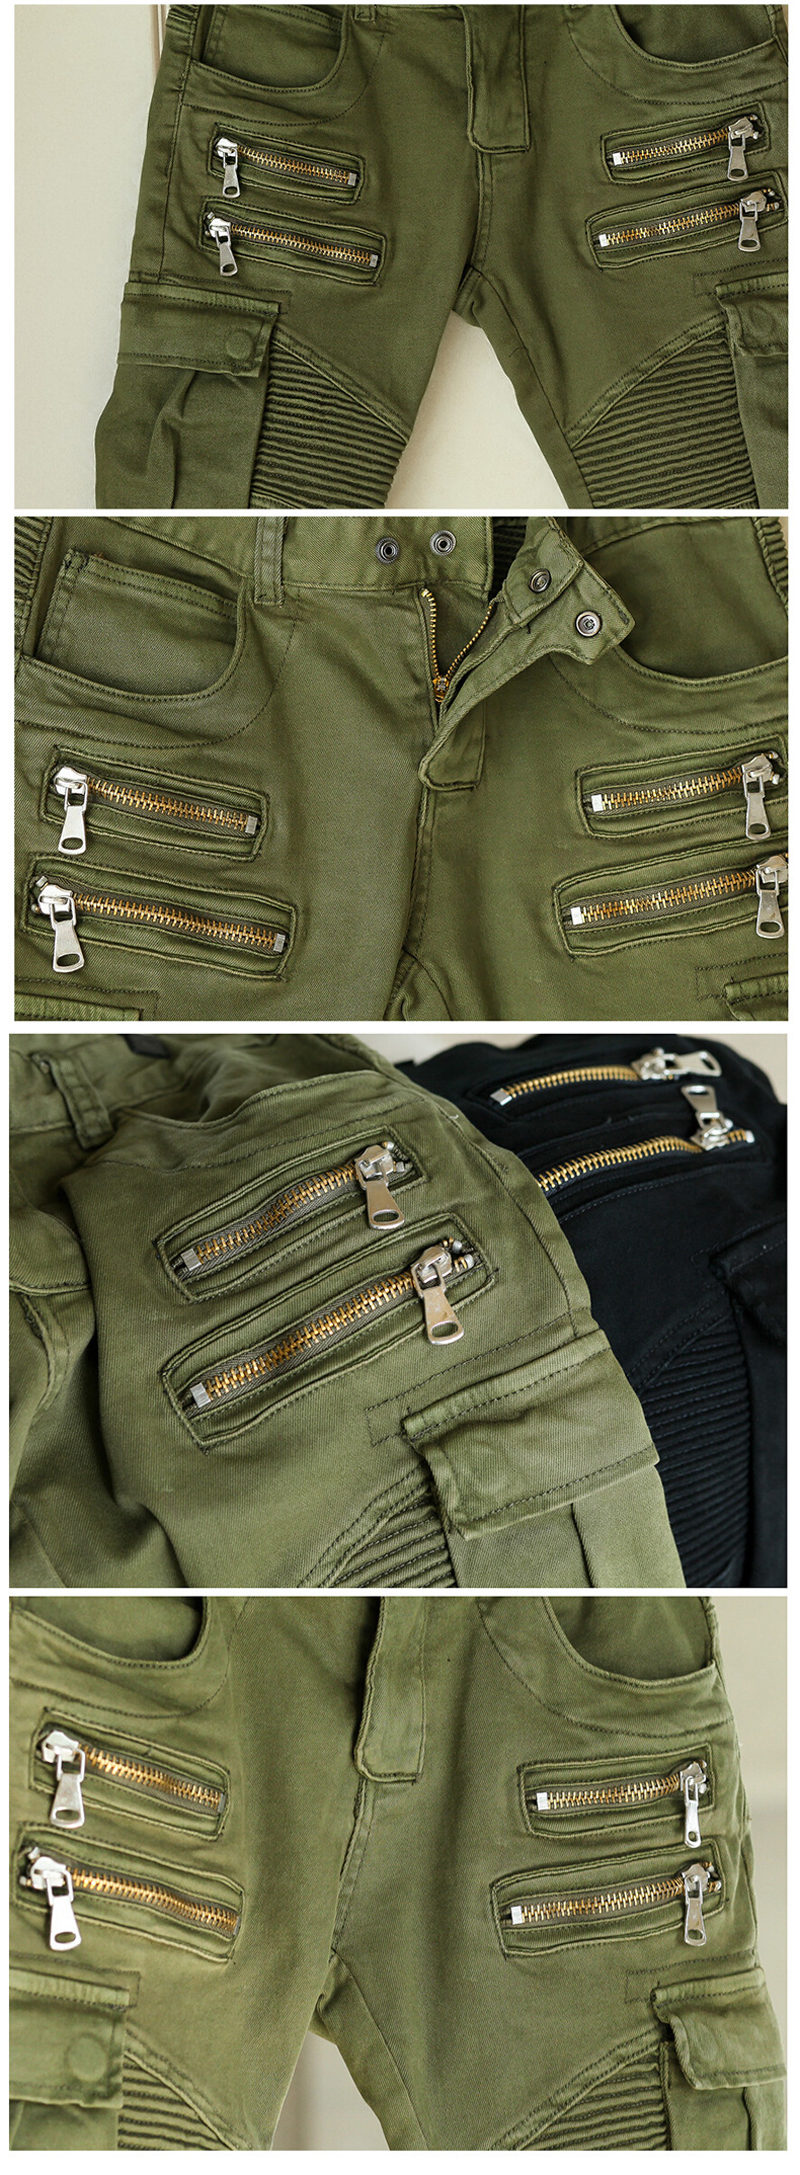 Fashion New Mens Denim Trousers Chinos Stretch Skinny Slim Fit Jeans All Waist Sizes